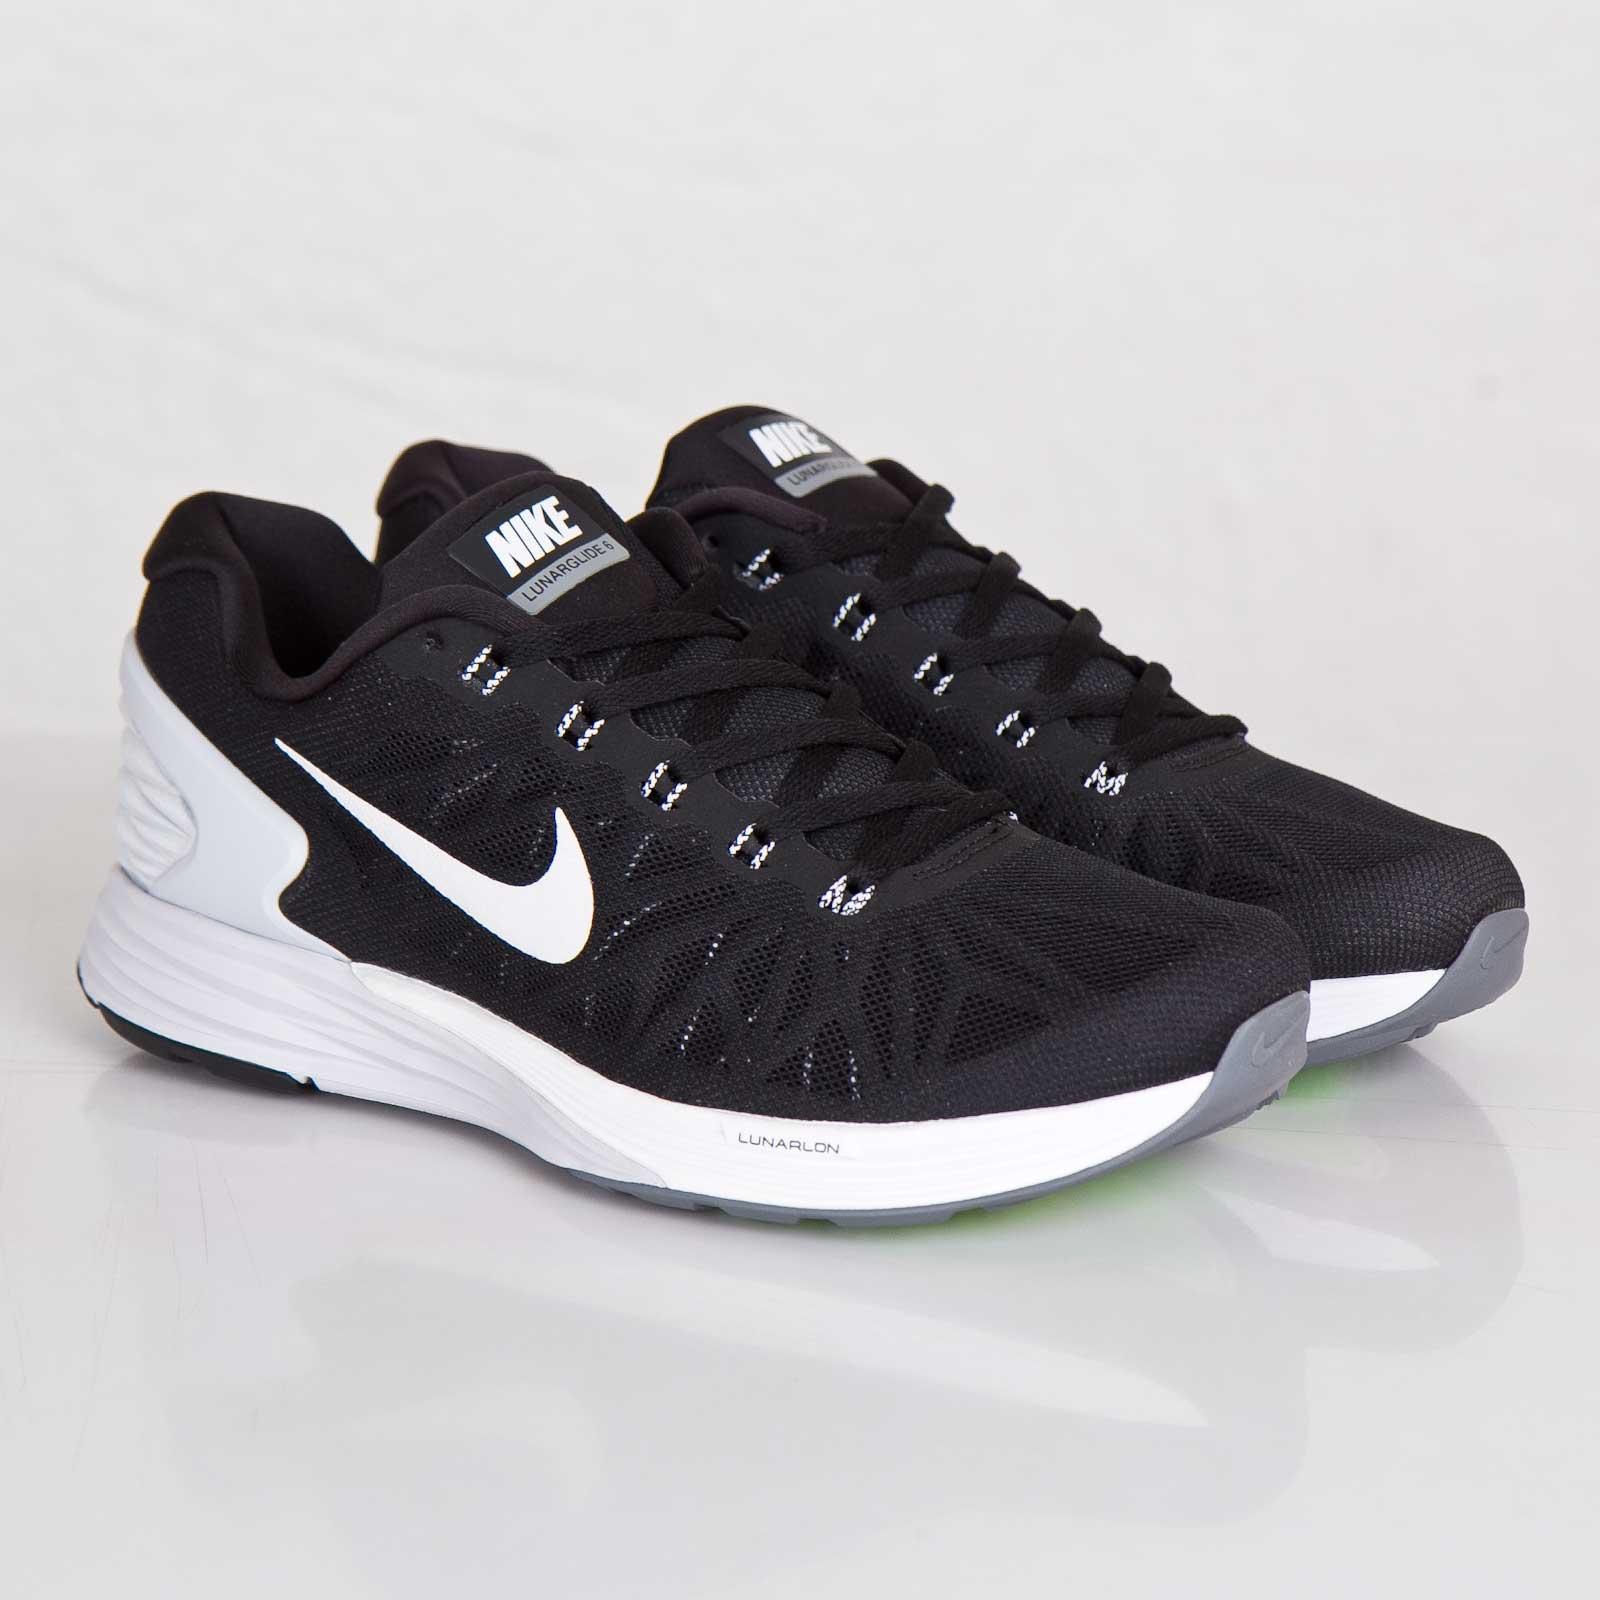 wholesale dealer 60d2d 63156 Nike Lunarglide 6